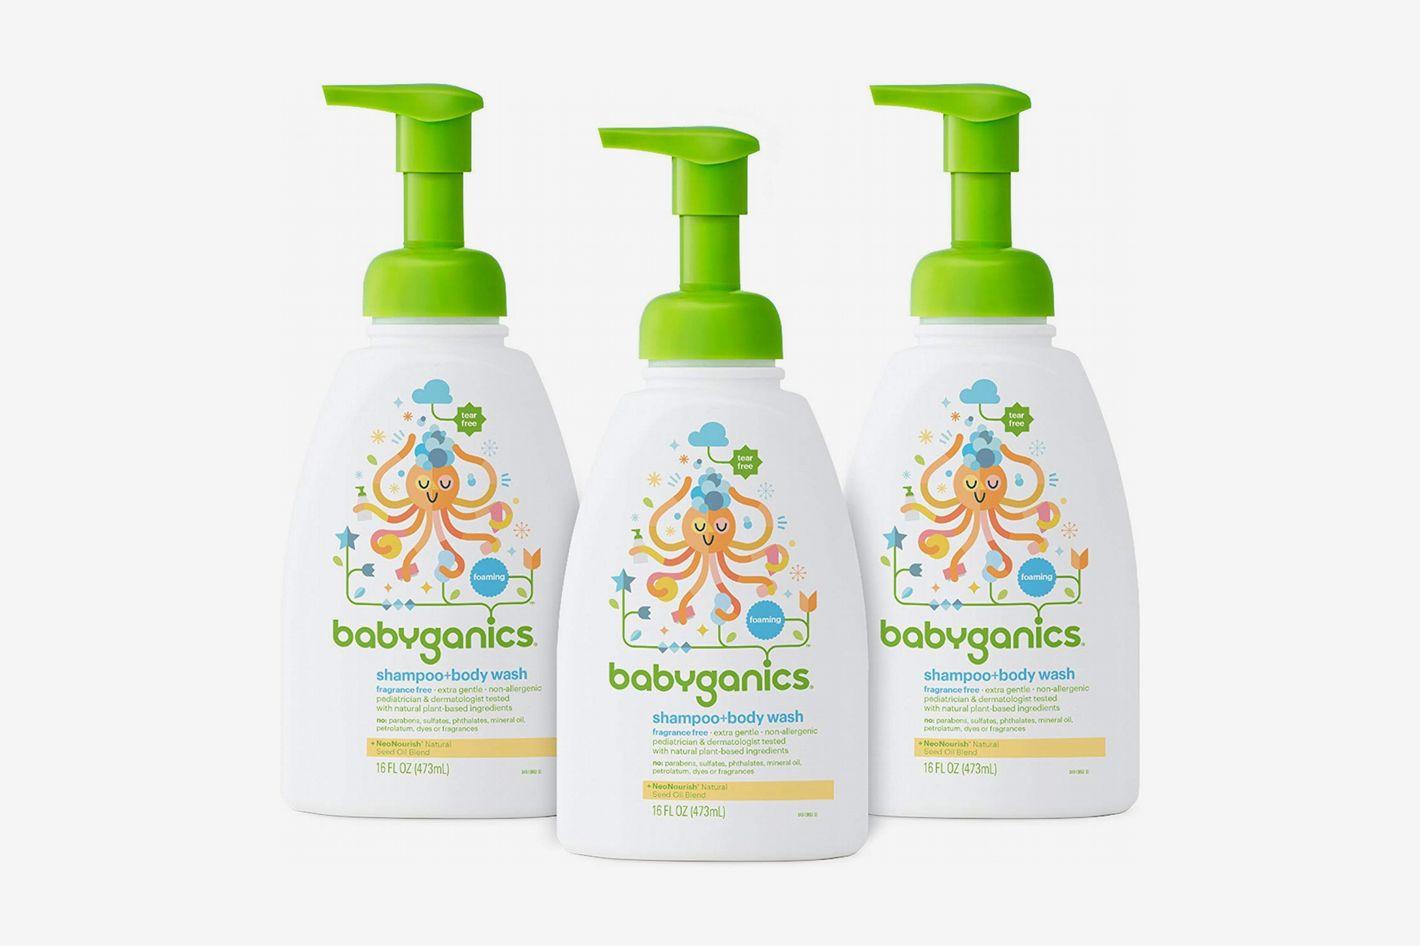 Babyganics Fragrance-Free Shampoo and Body Wash